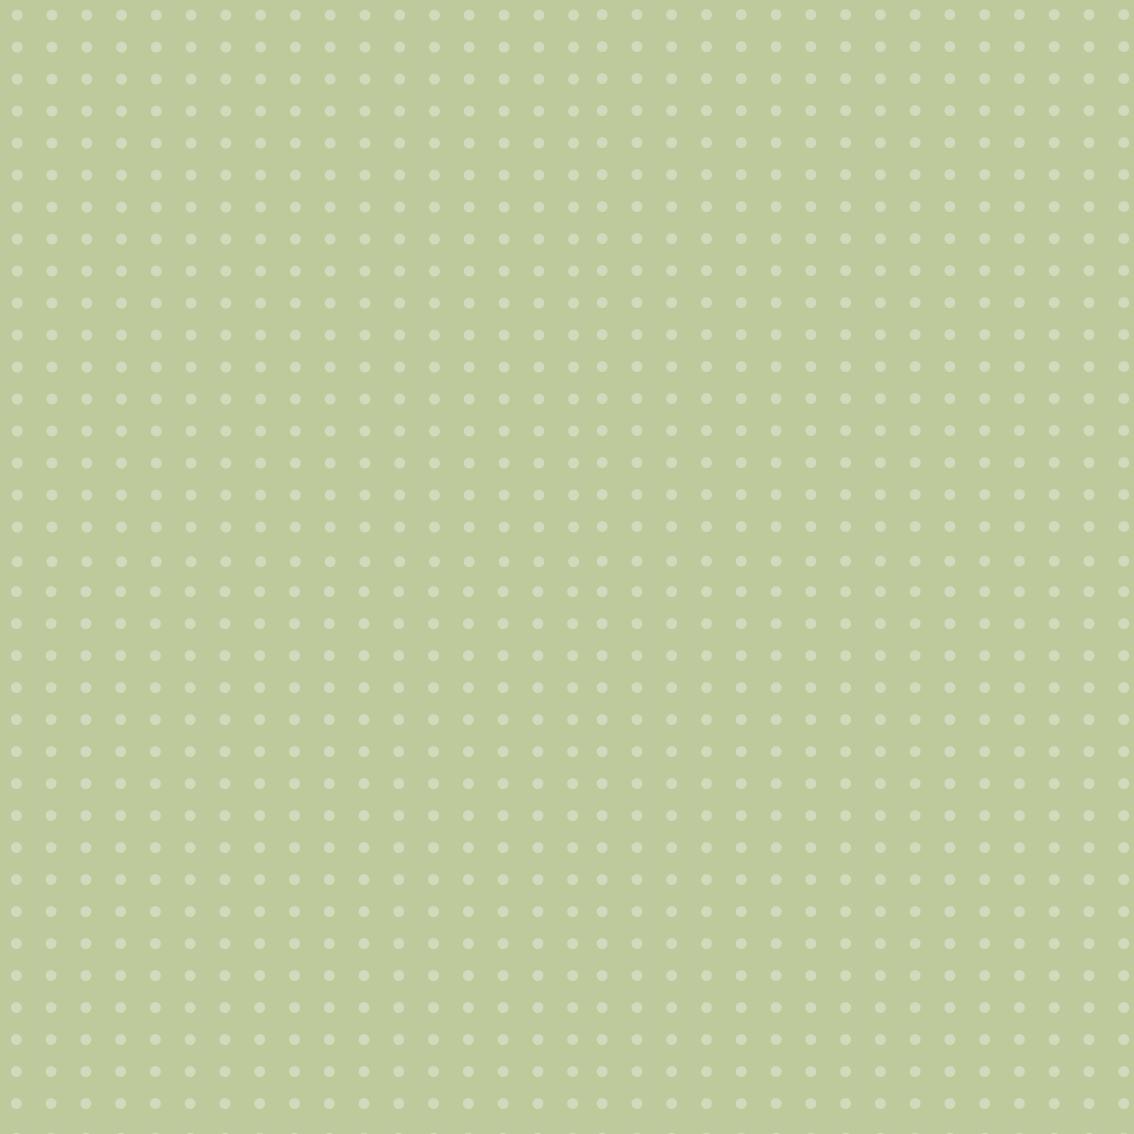 hintergrund1a_grün.png